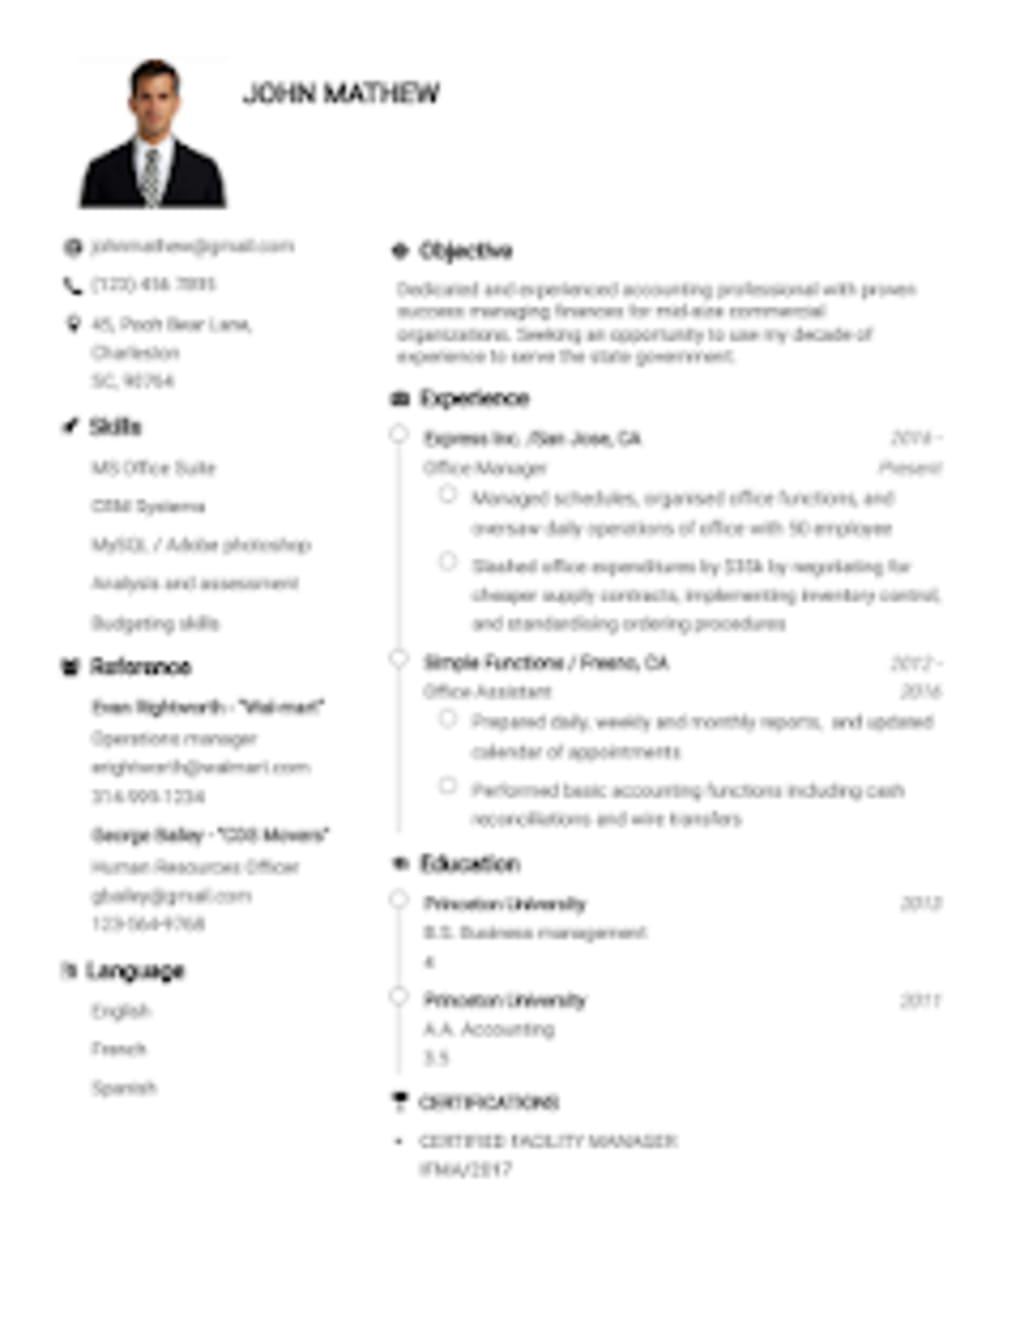 Resume Builder App Free CV Maker Templates 2019